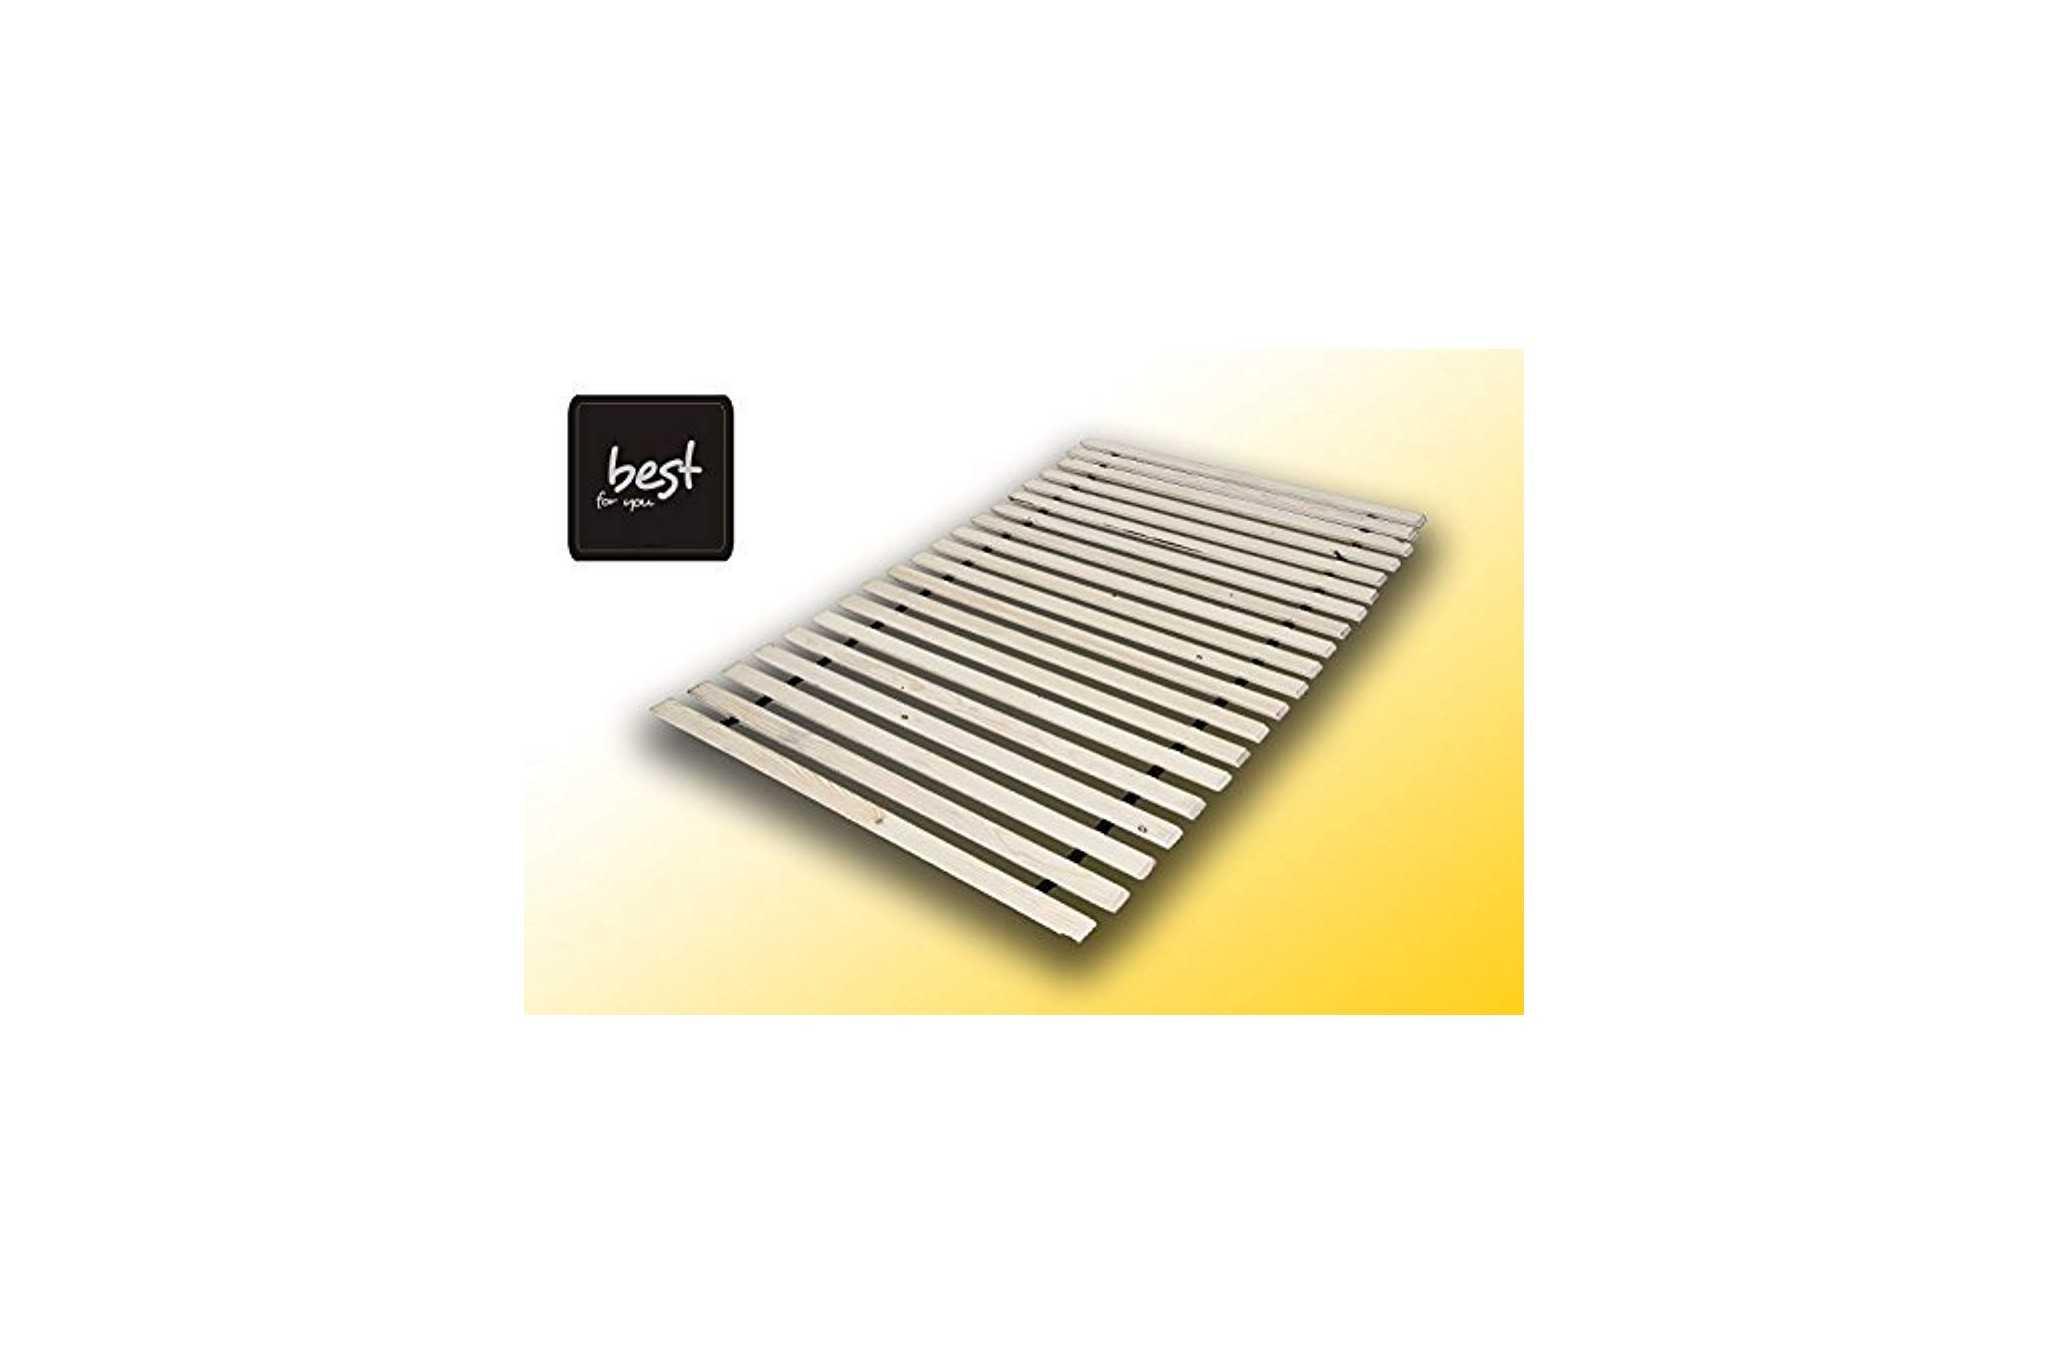 best for you rollrost aus 15 oder 20 massiven stabilen holzlatten geeignet f r alle matratzen. Black Bedroom Furniture Sets. Home Design Ideas